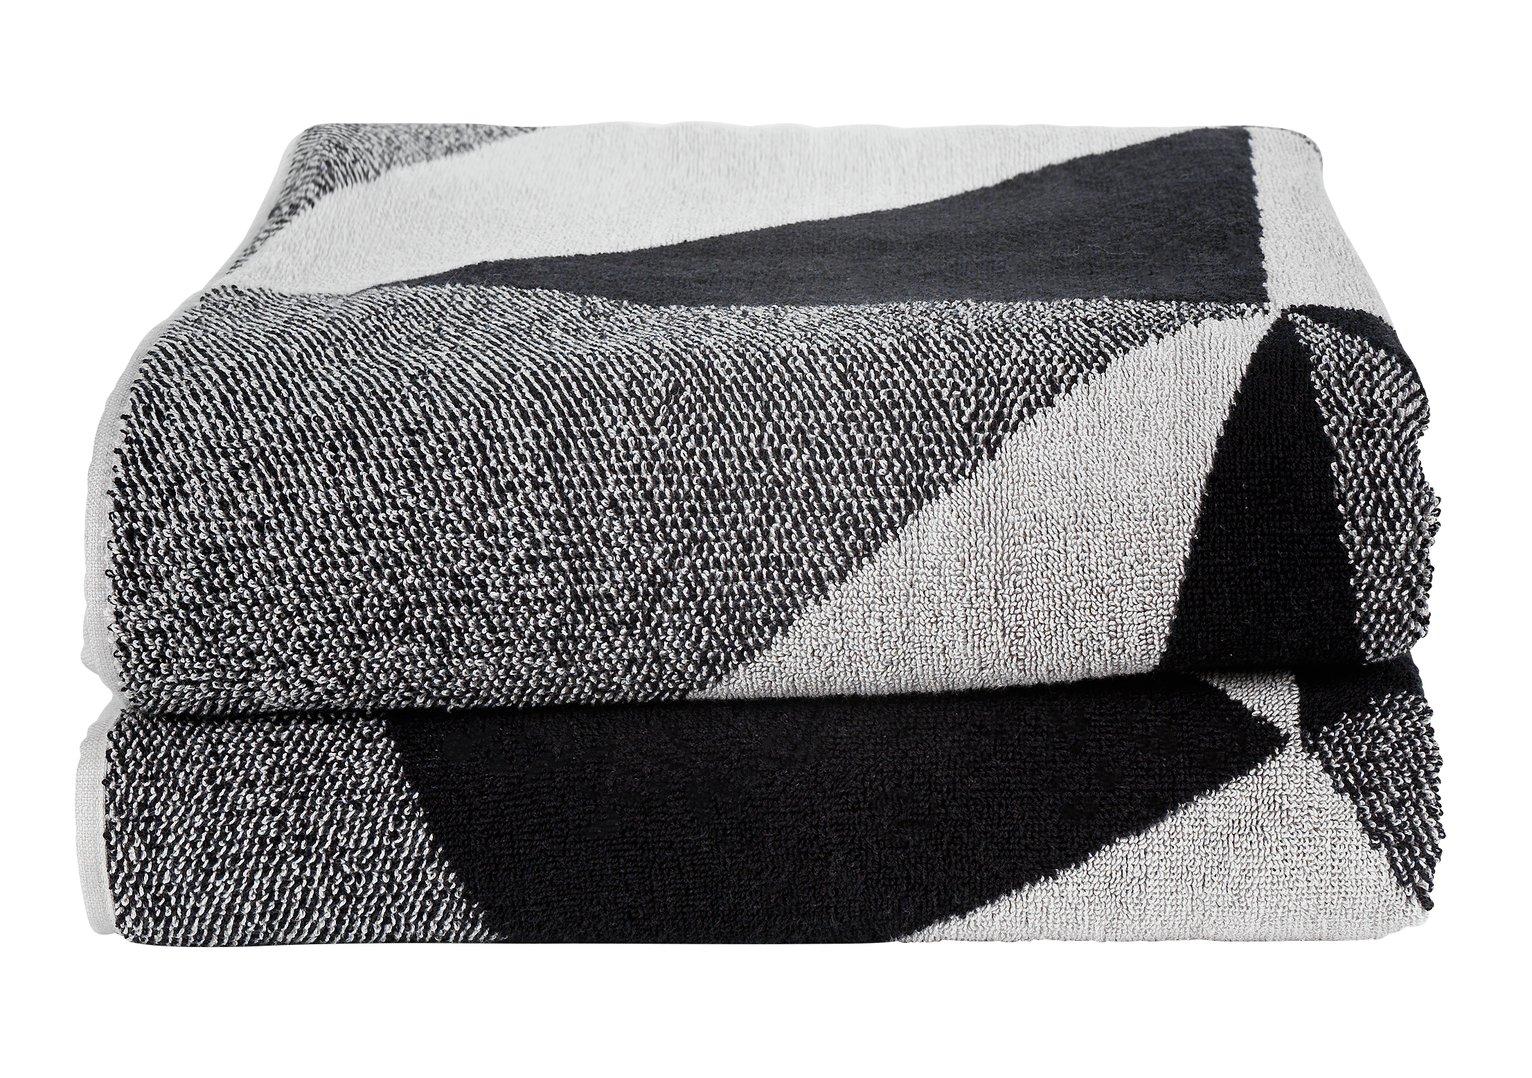 Argos Home Shard 2 Piece Towel Bale - Black